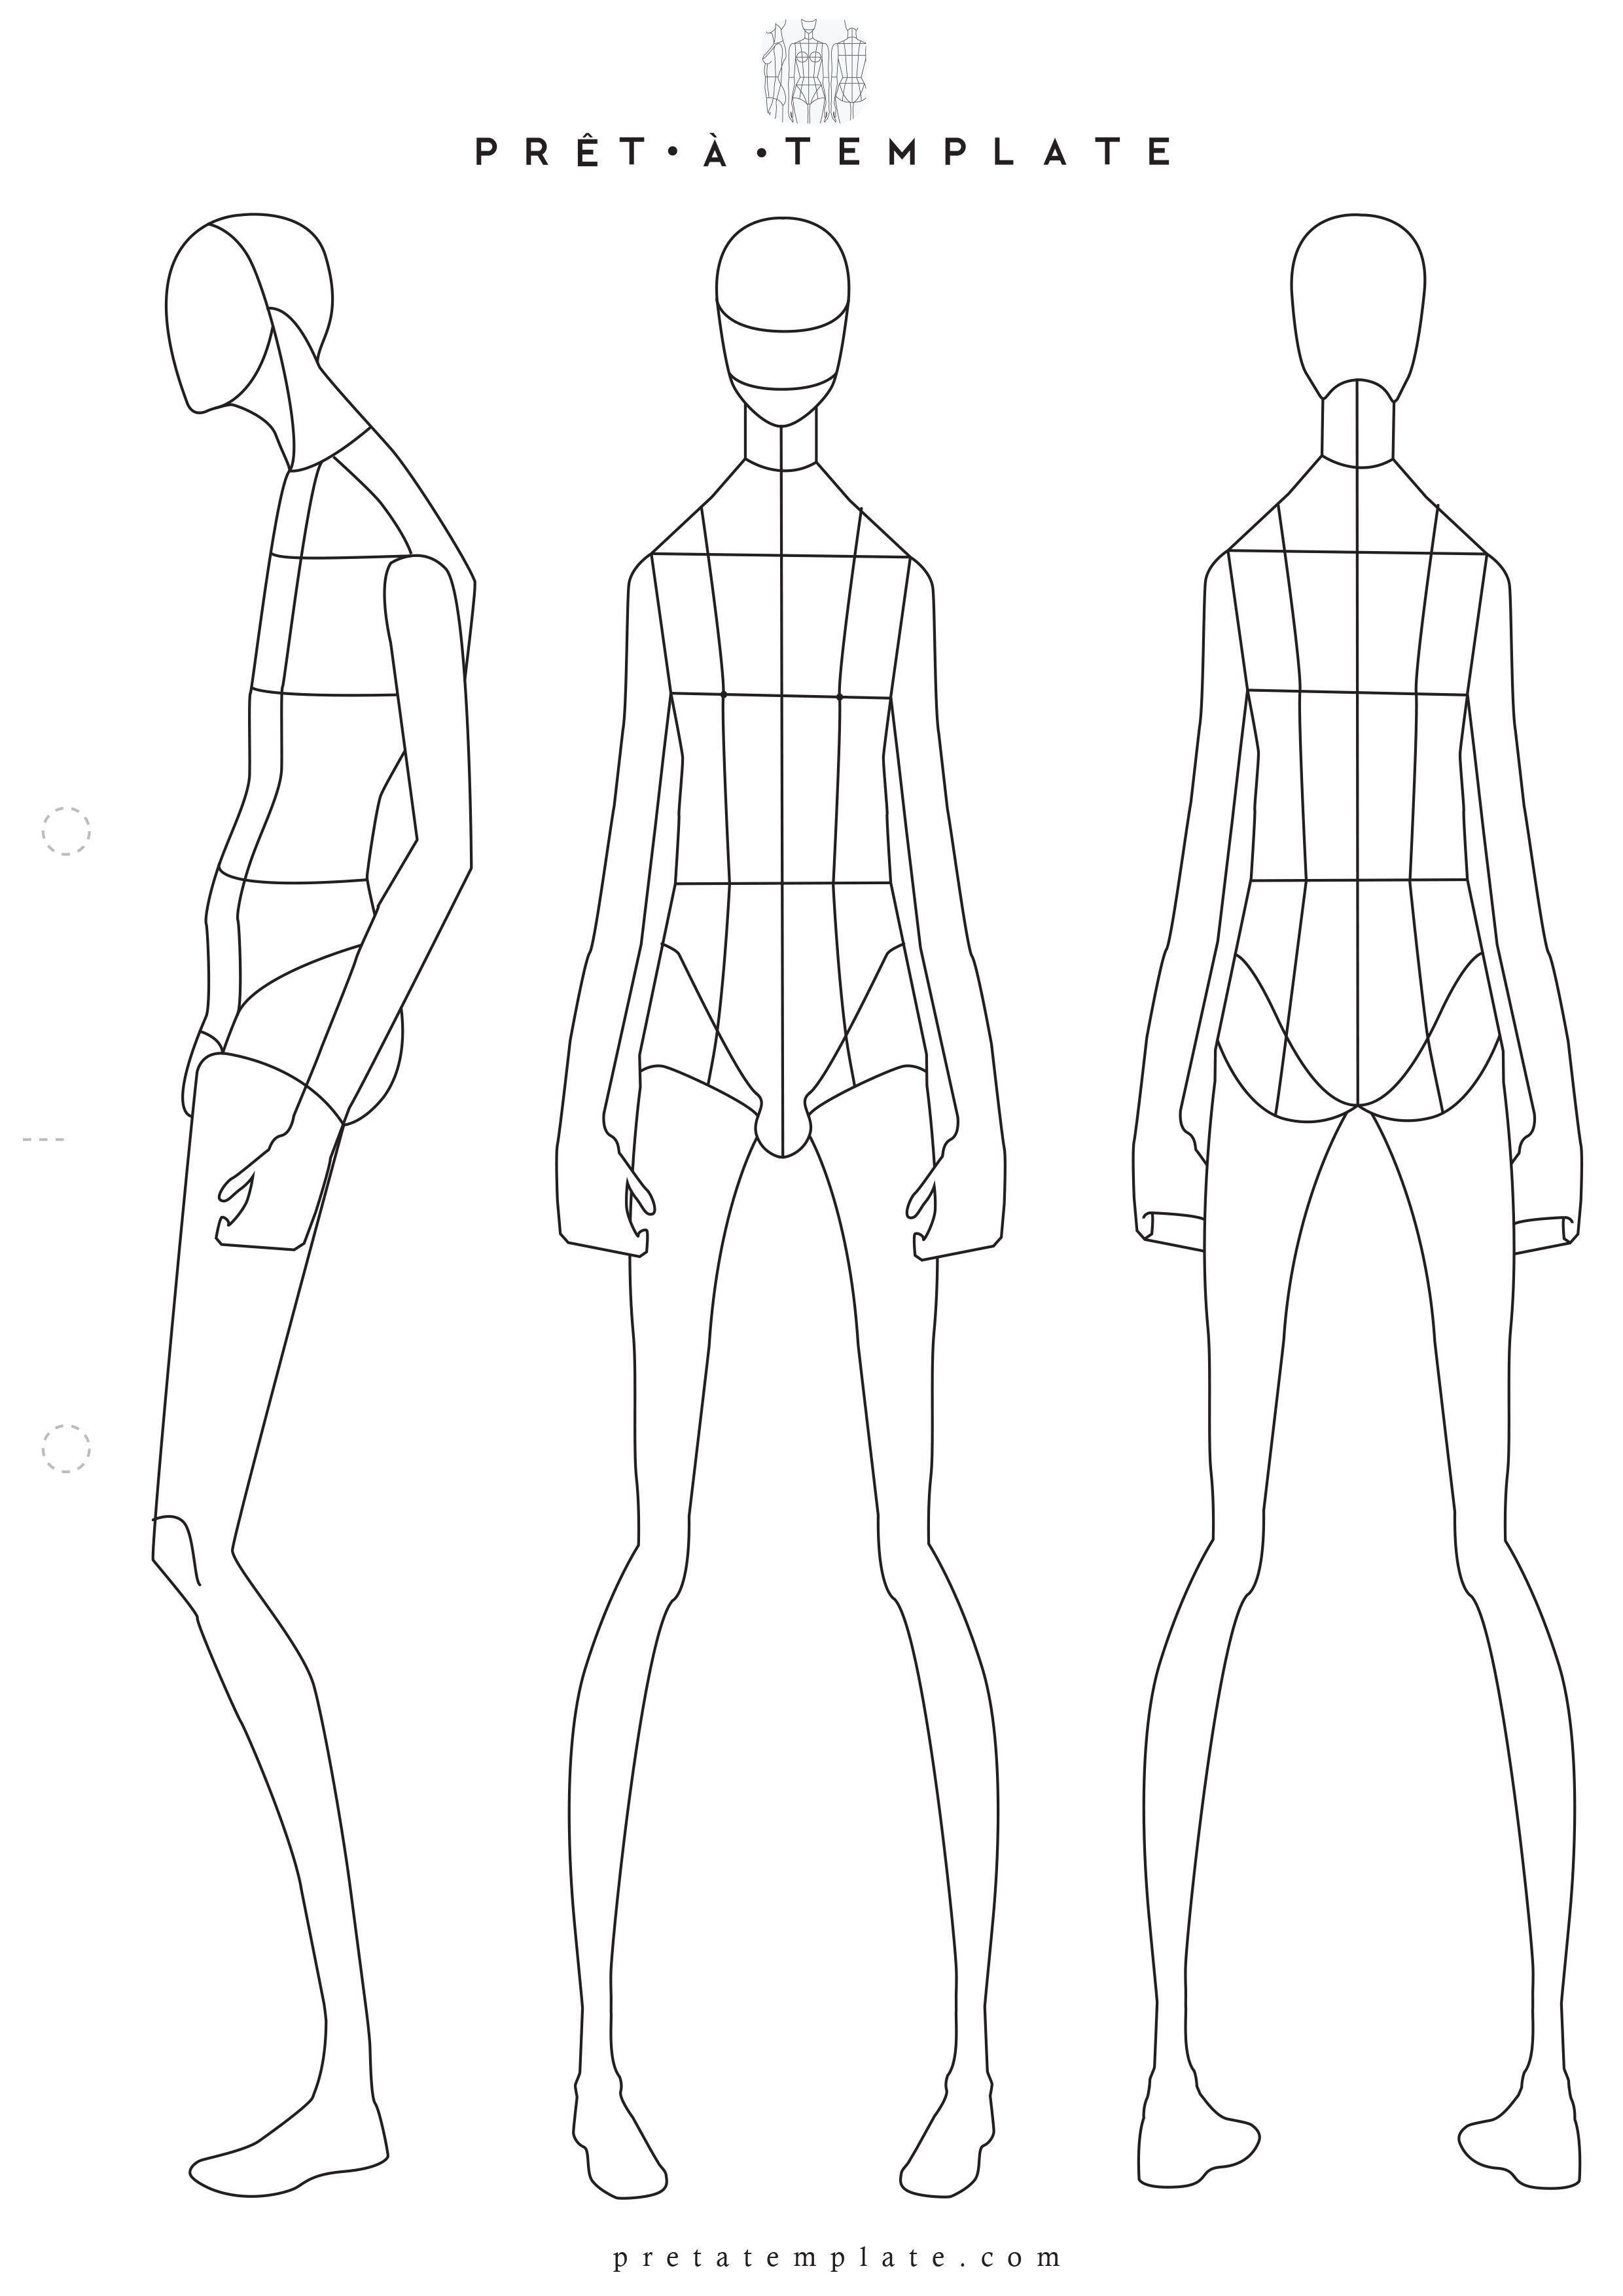 001 Sensational Body Template For Fashion Design High Definition  Female Male HumanFull